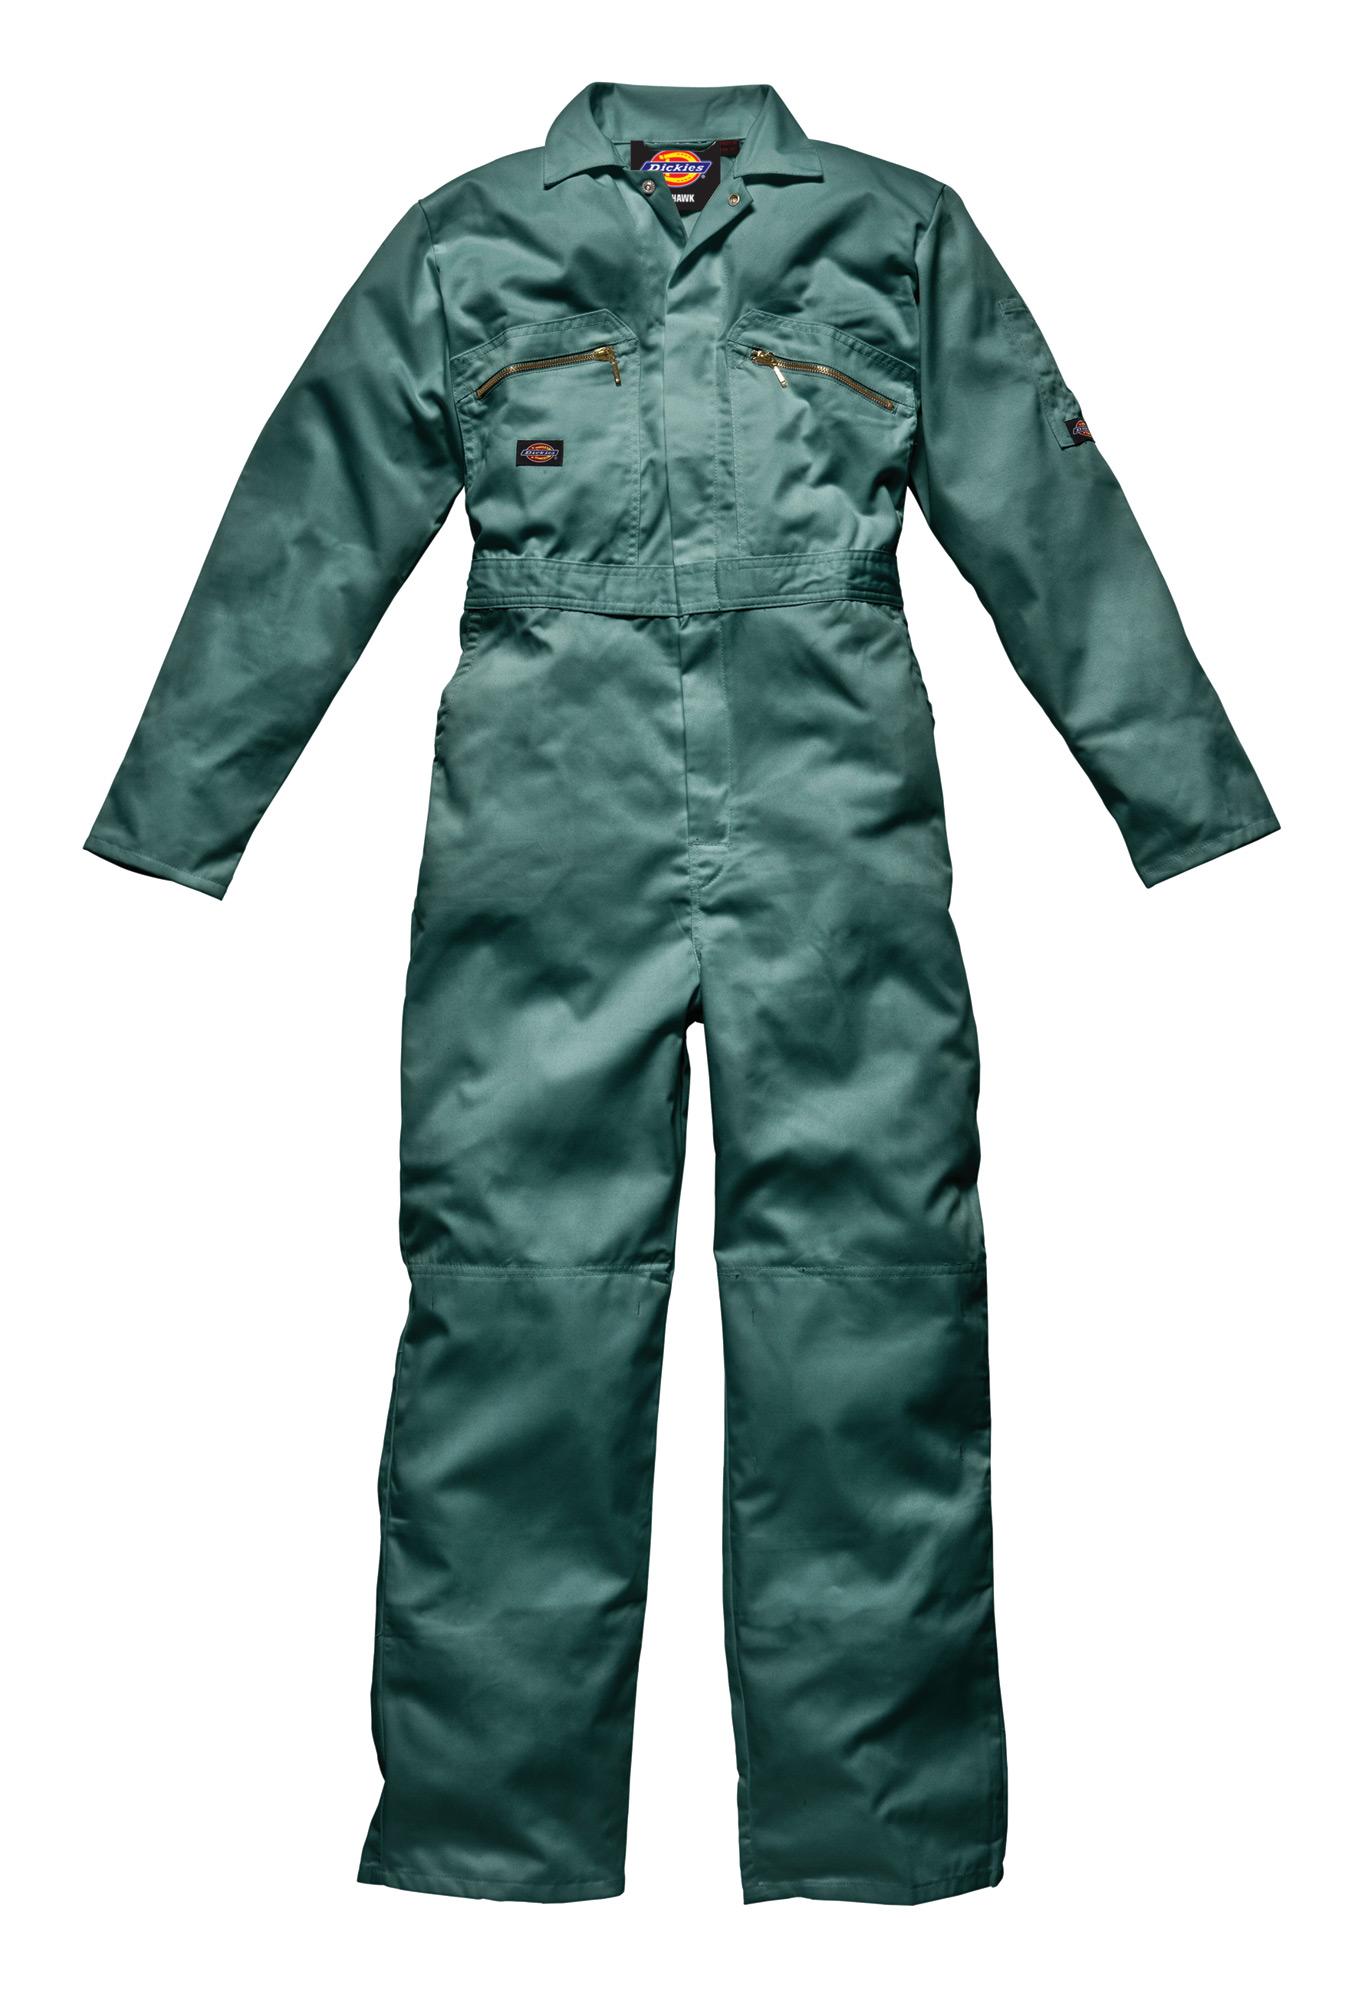 Dickies Redhawk Wd4839 Overalls Coveralls Boilersuit Green